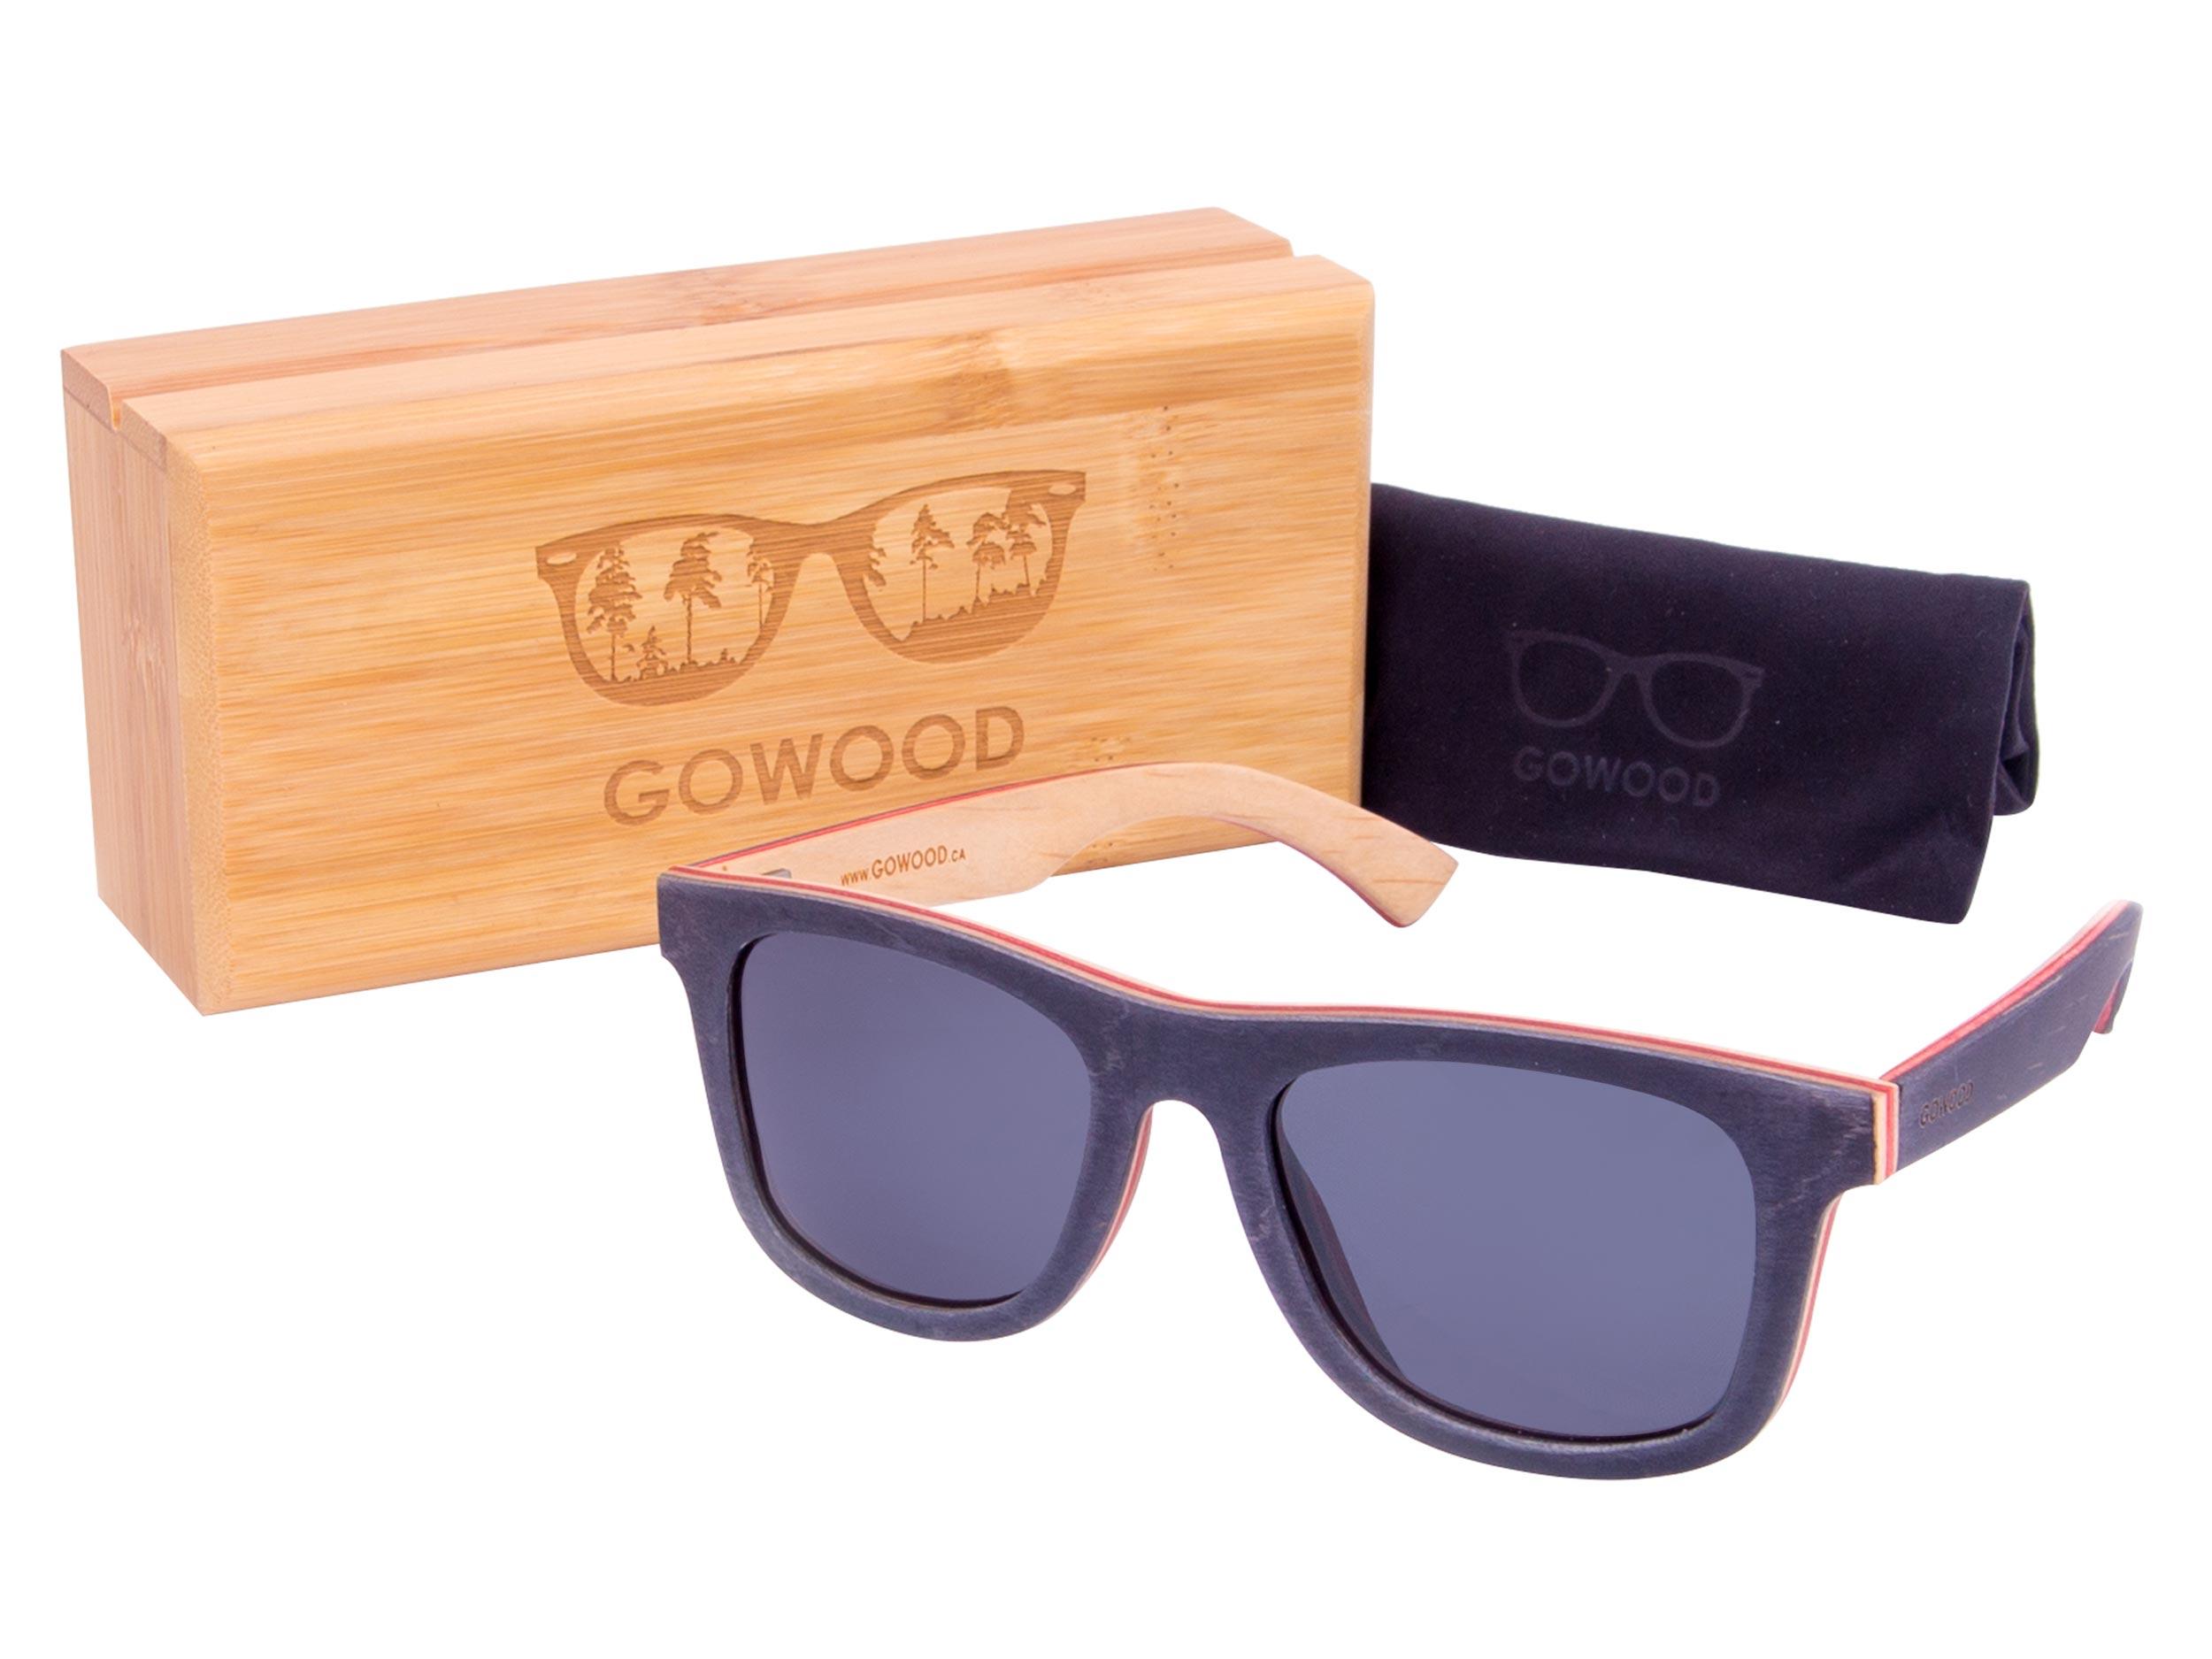 Black skateboard wood sunglasses set